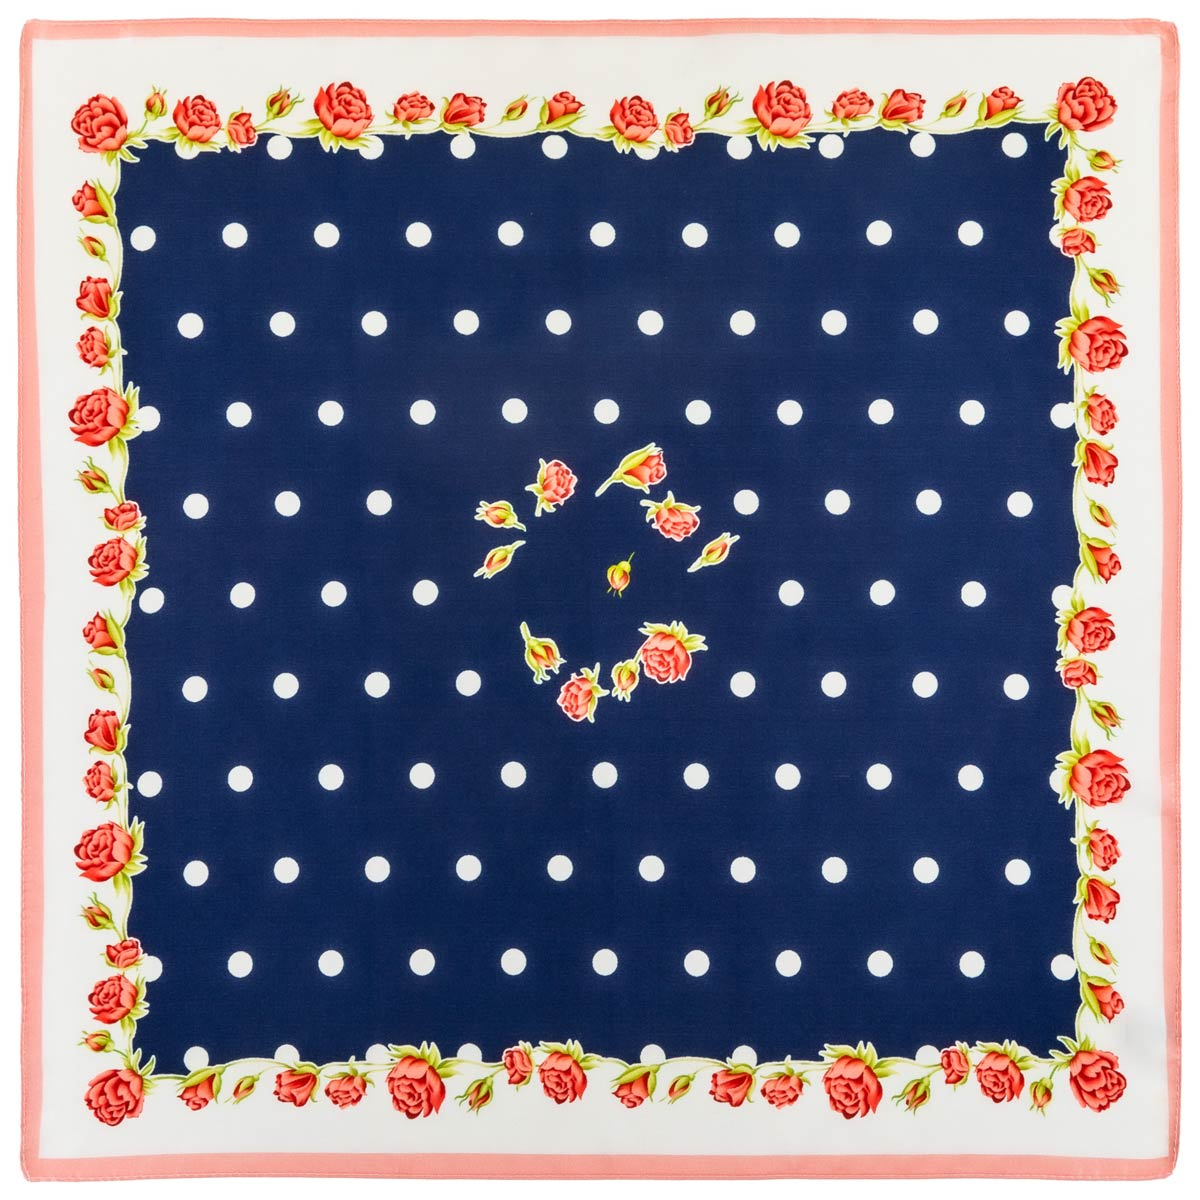 AT-06358_A12-1-Foulard-soie-roses-marine